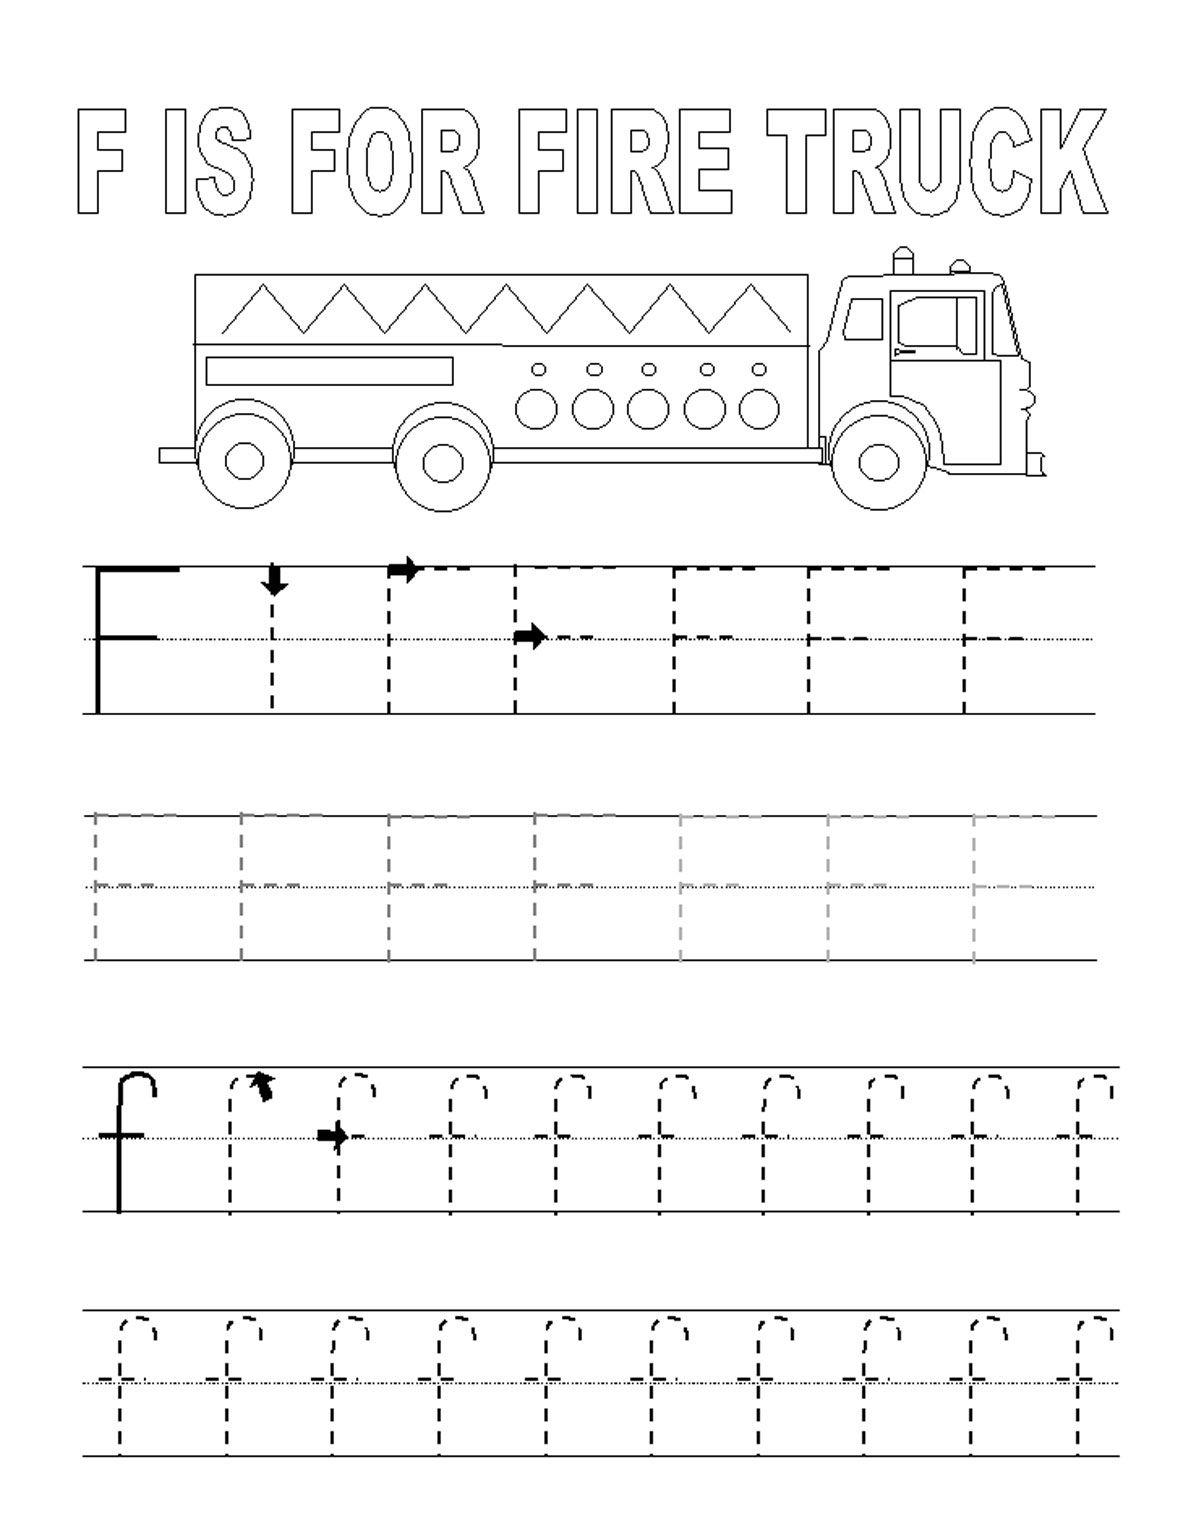 Alphabet Tracer Pages F Fire Trucks Kids Coloring Pages Printable Col Alphabet Tracing Printables Alphabet Tracing Worksheets Printable Alphabet Worksheets